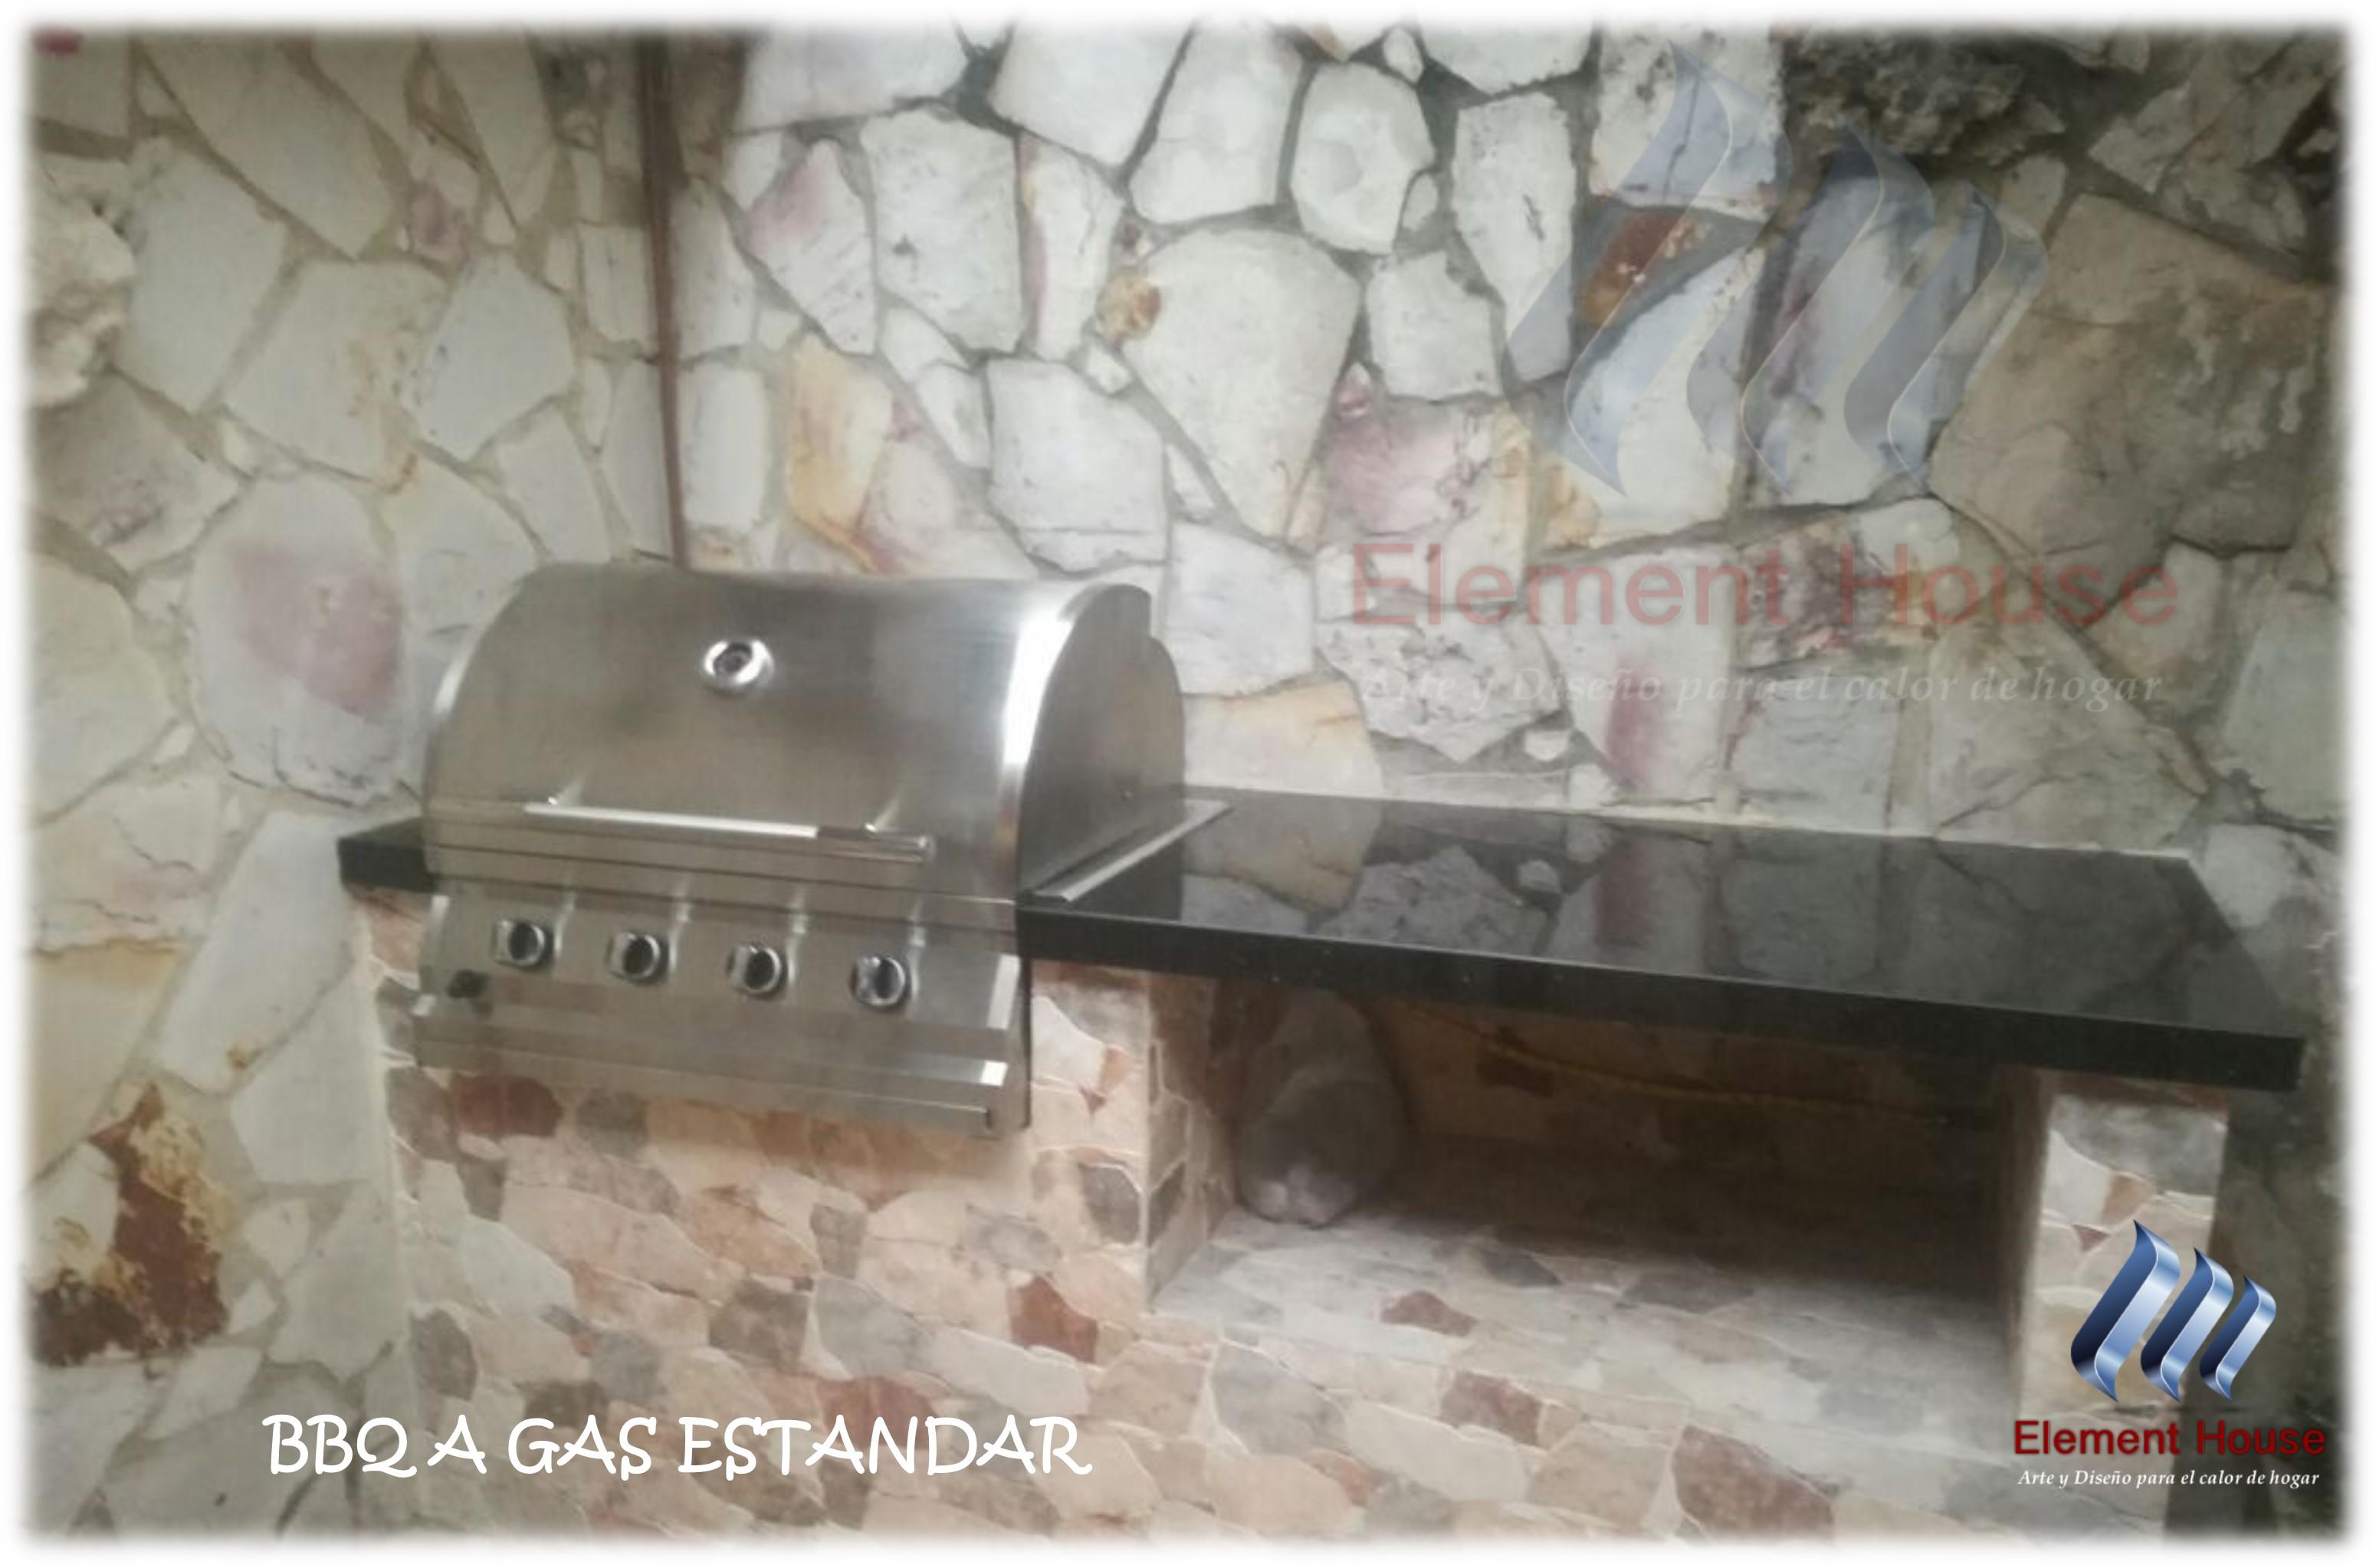 BBQ ELEMENT HOUSE (9)